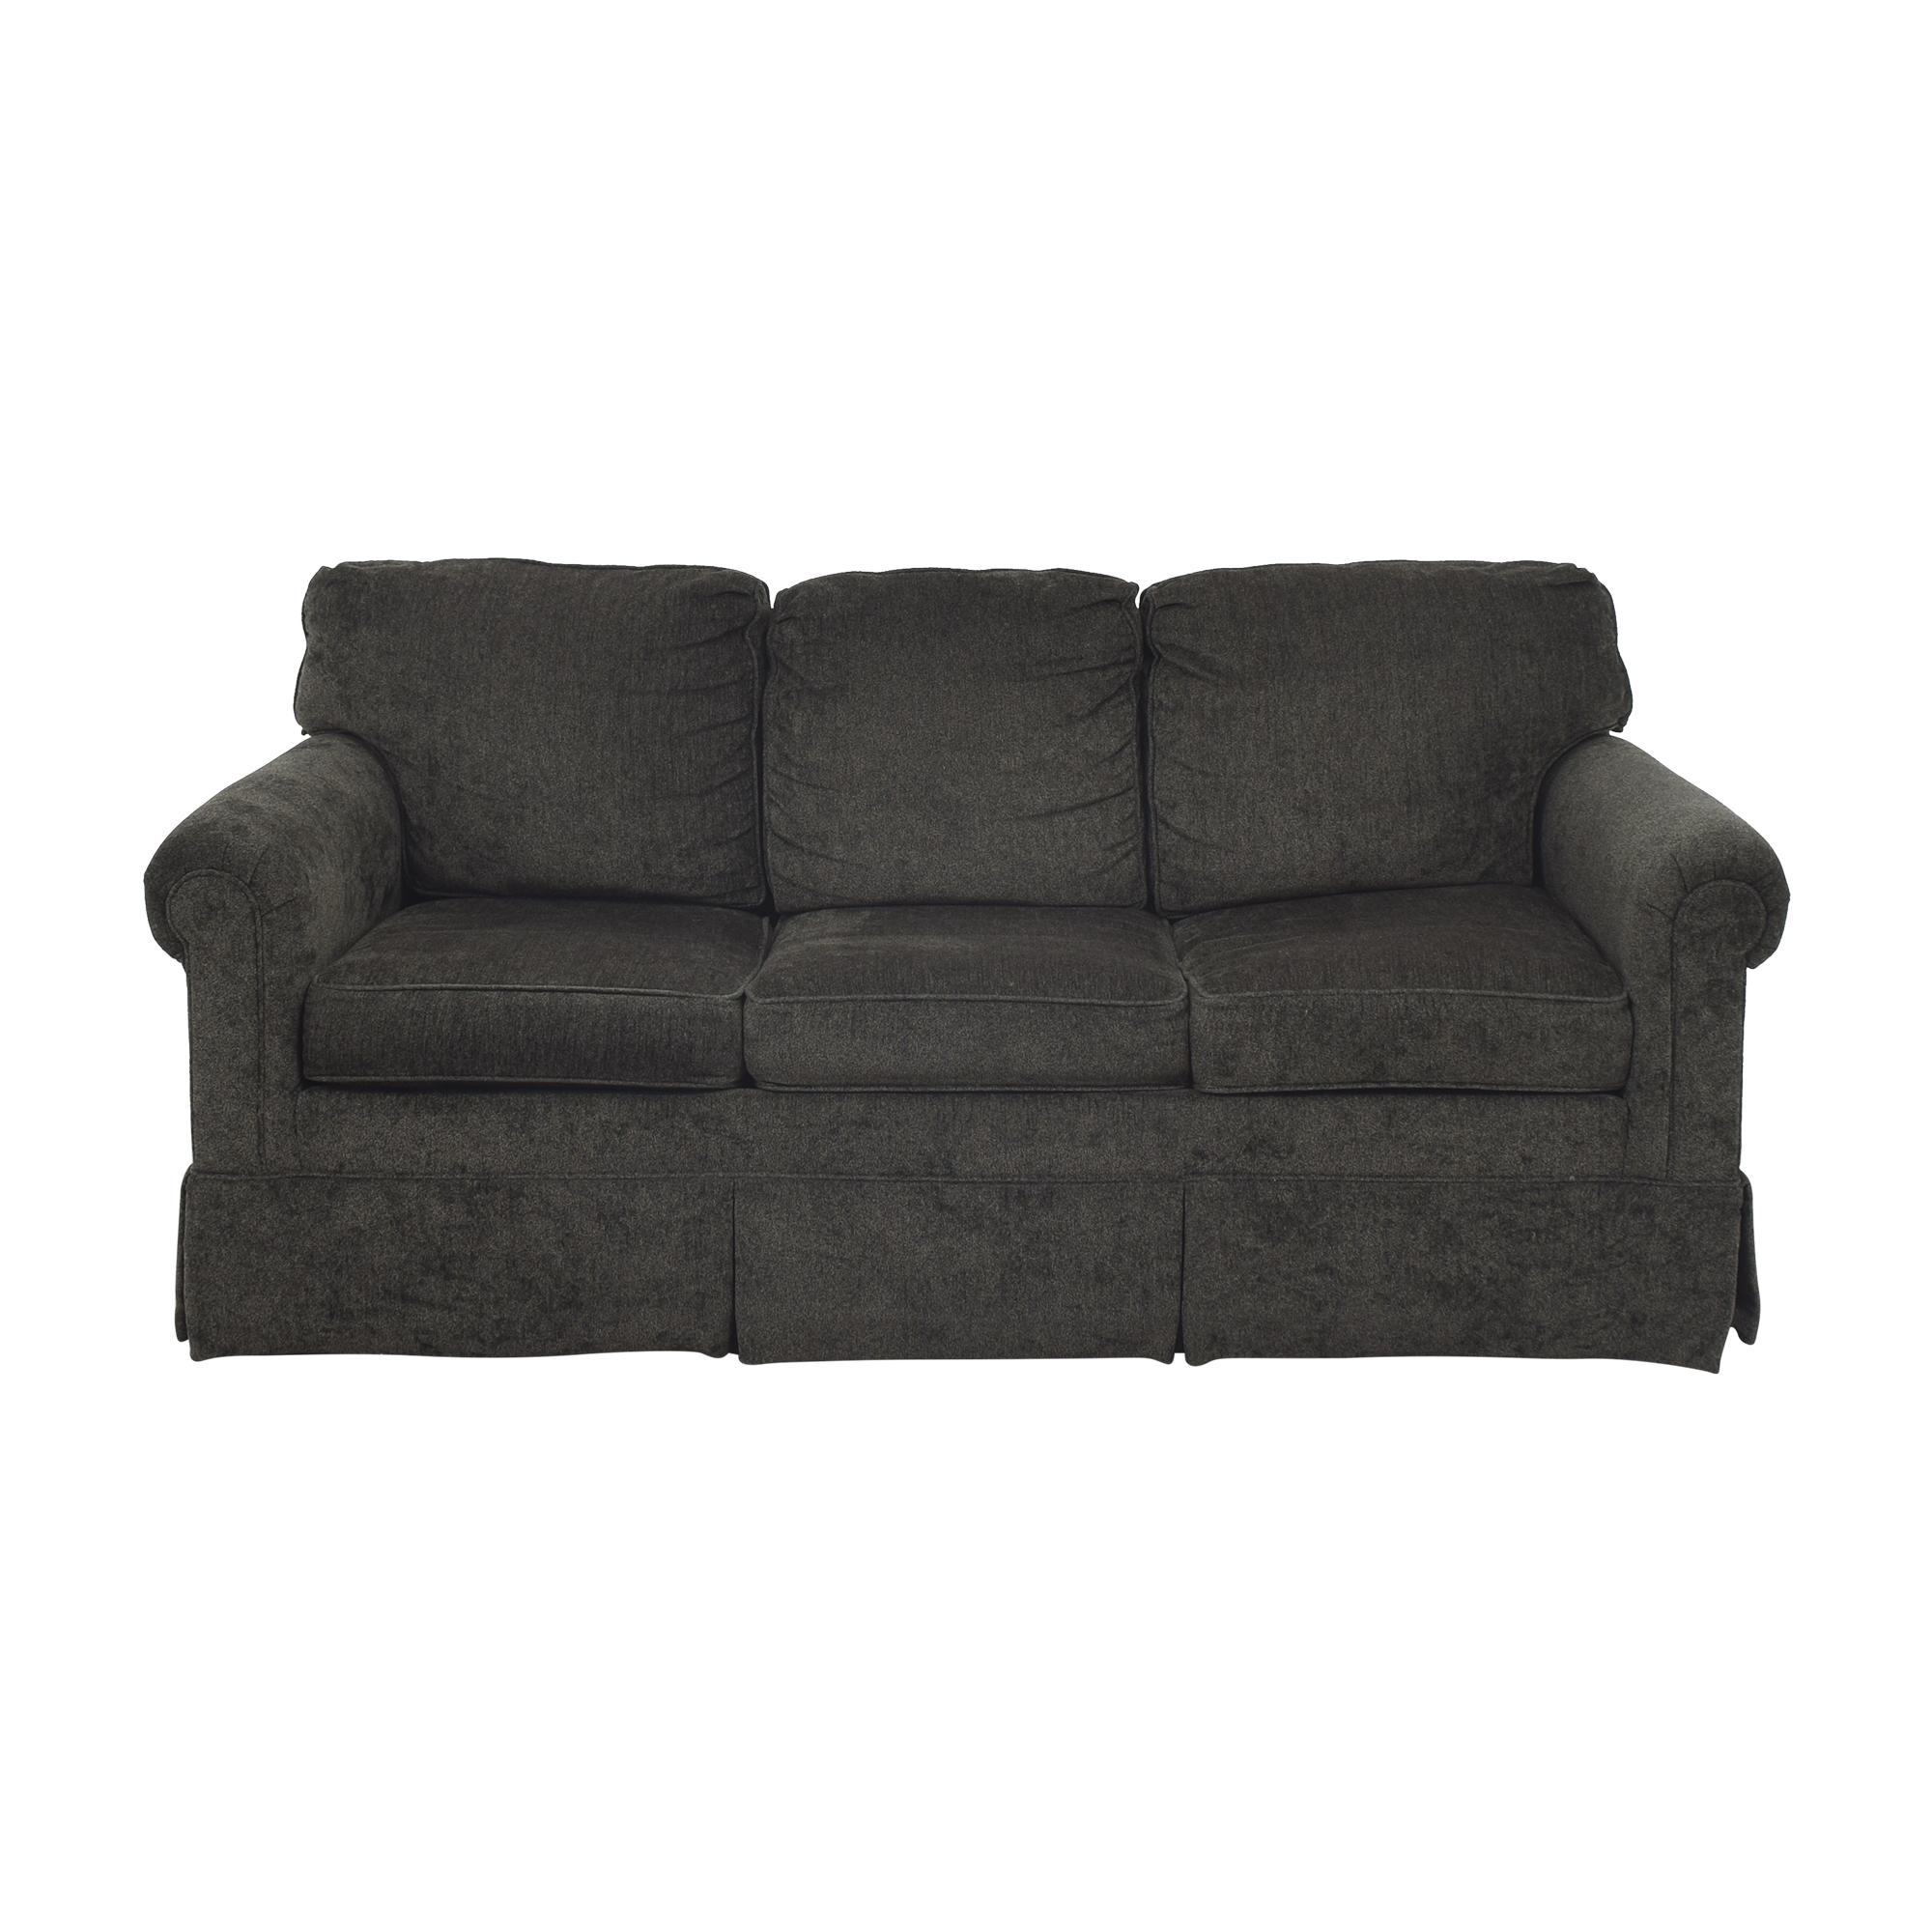 Ethan Allen Ethan Allen Bennett Three Cushion Sofa for sale